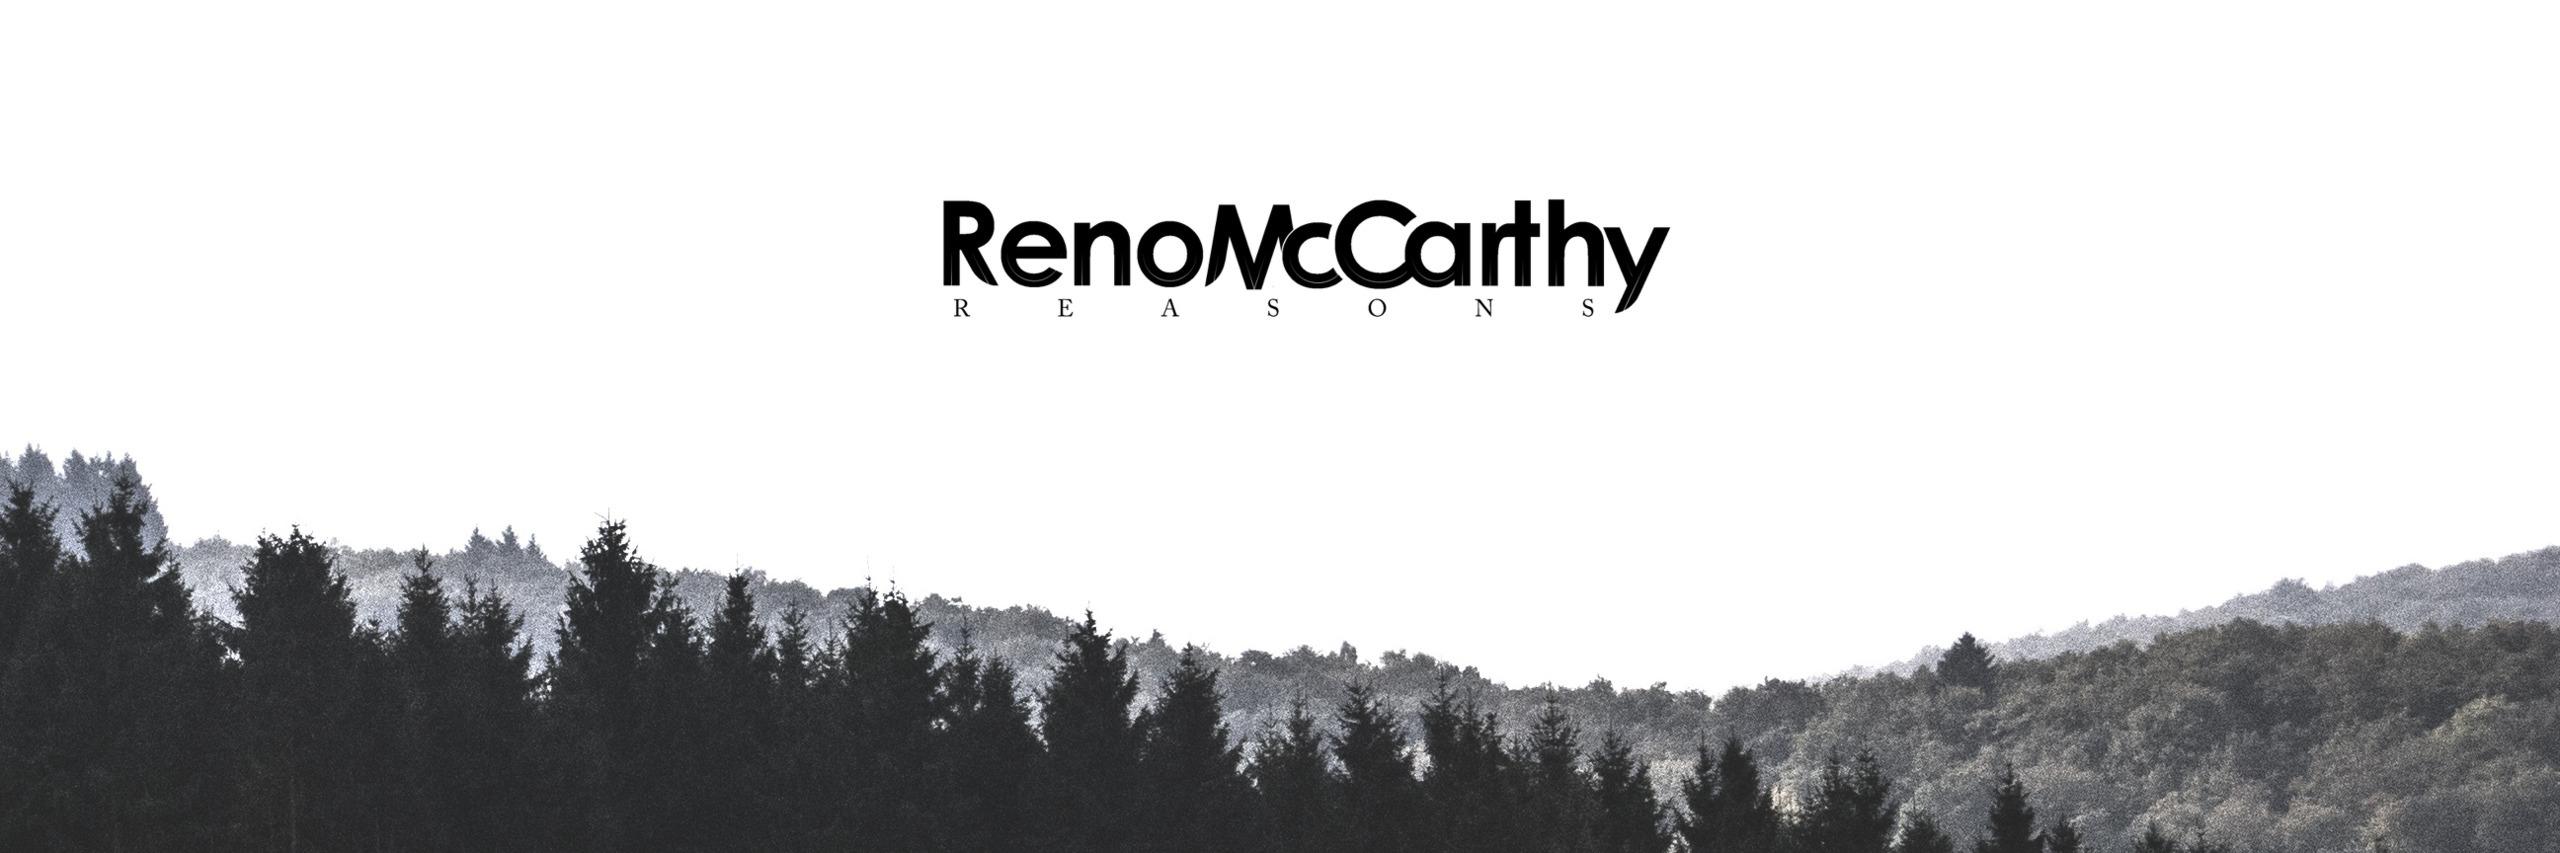 Reno McCarthy  (@renomccarthy) Cover Image